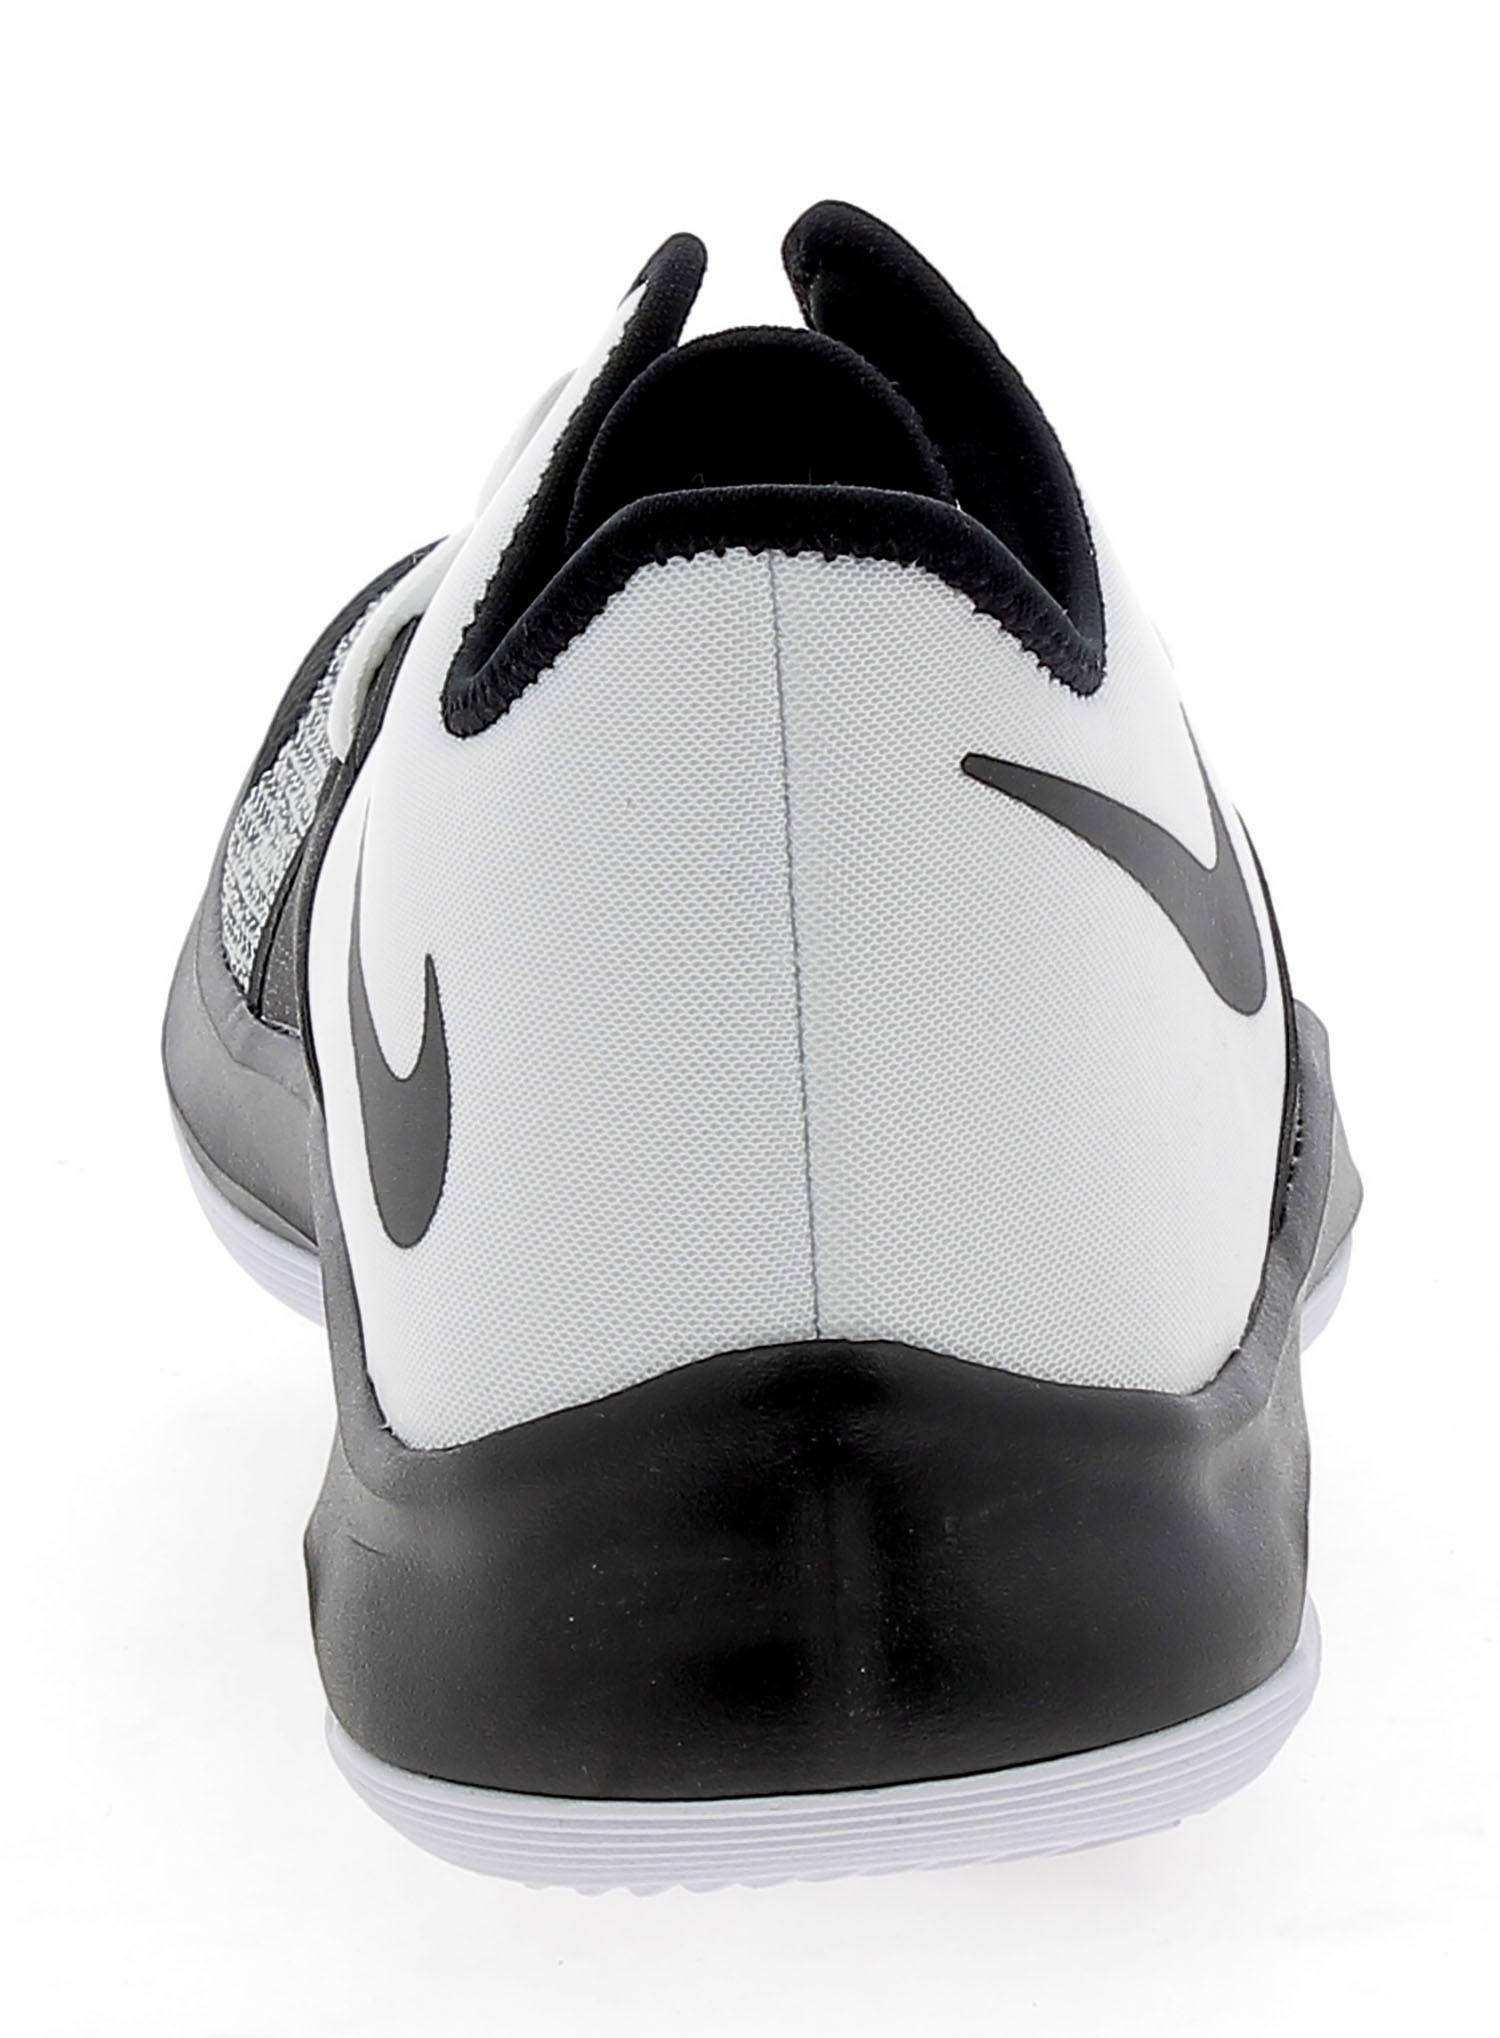 nike nike air versitile iii scarpe da basket uomo nere ao4430100